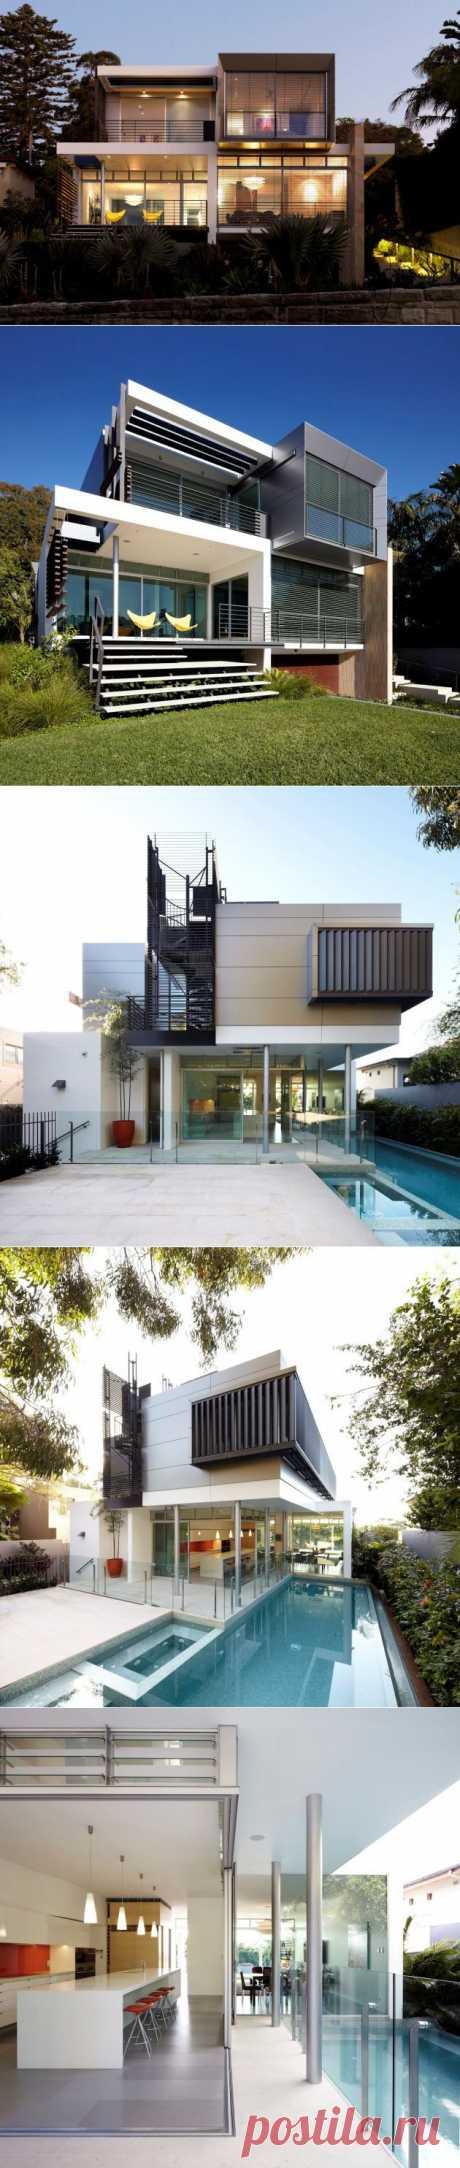 Wentworth Rd House by Edward Szewczyk Architects » CONTEMPORIST